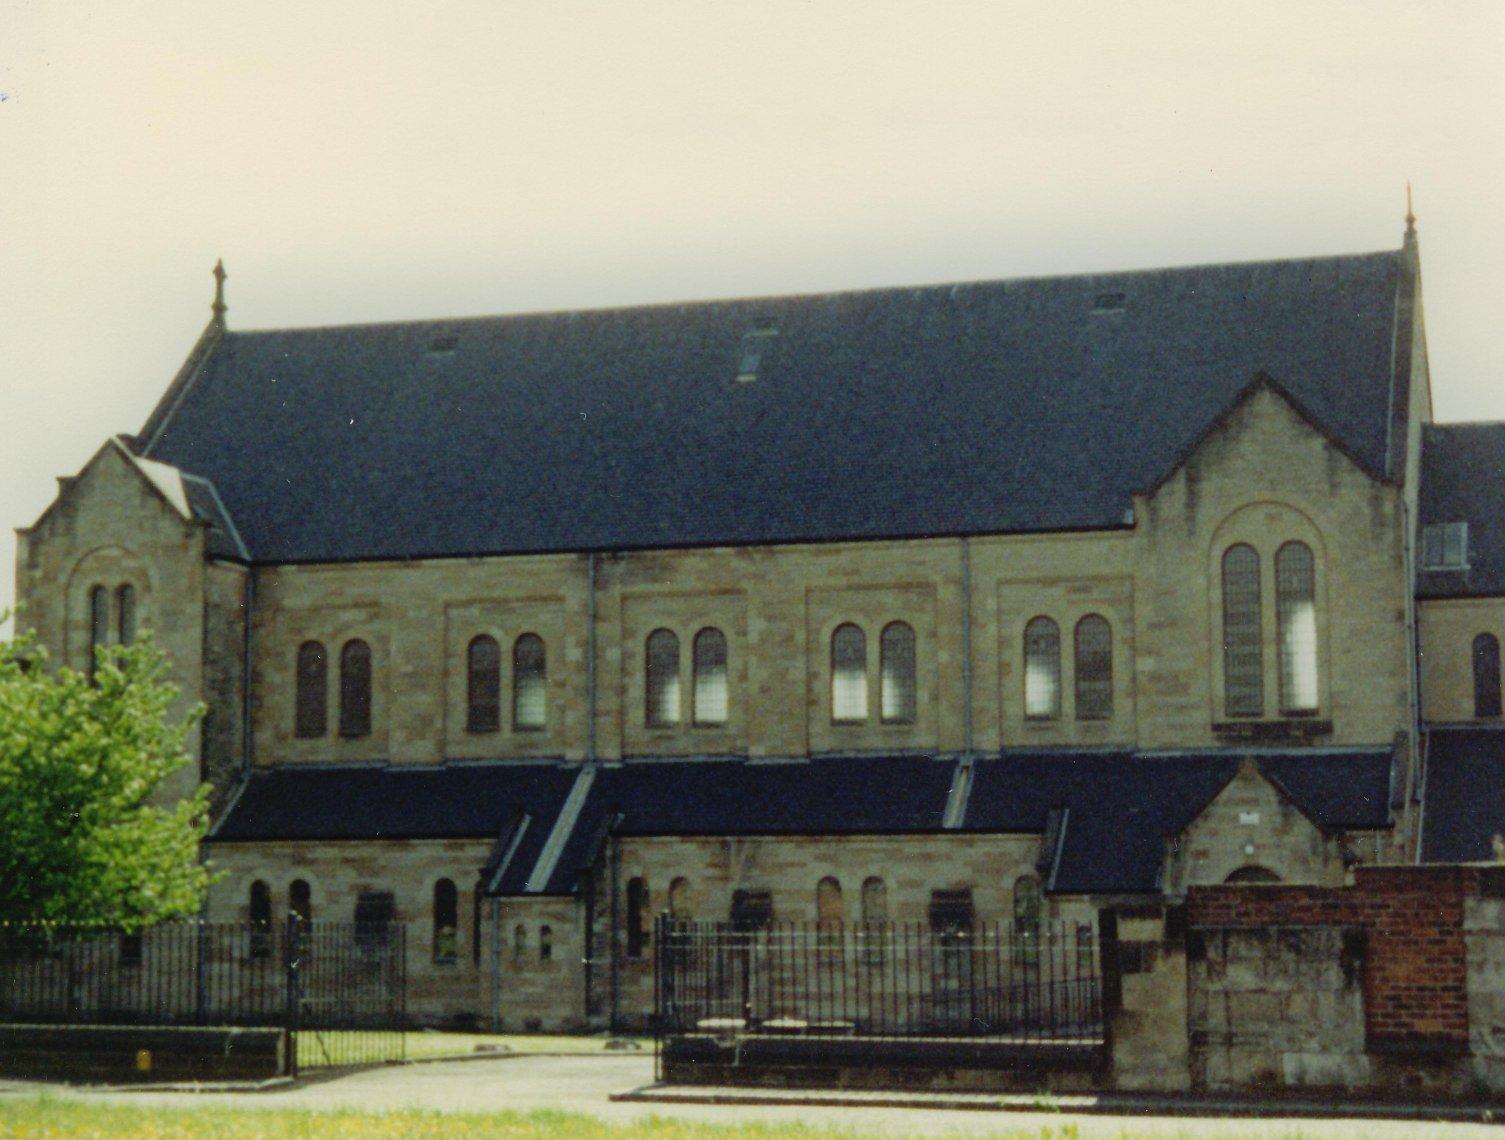 The Roman Catholic Cathedral of Saint Mirin